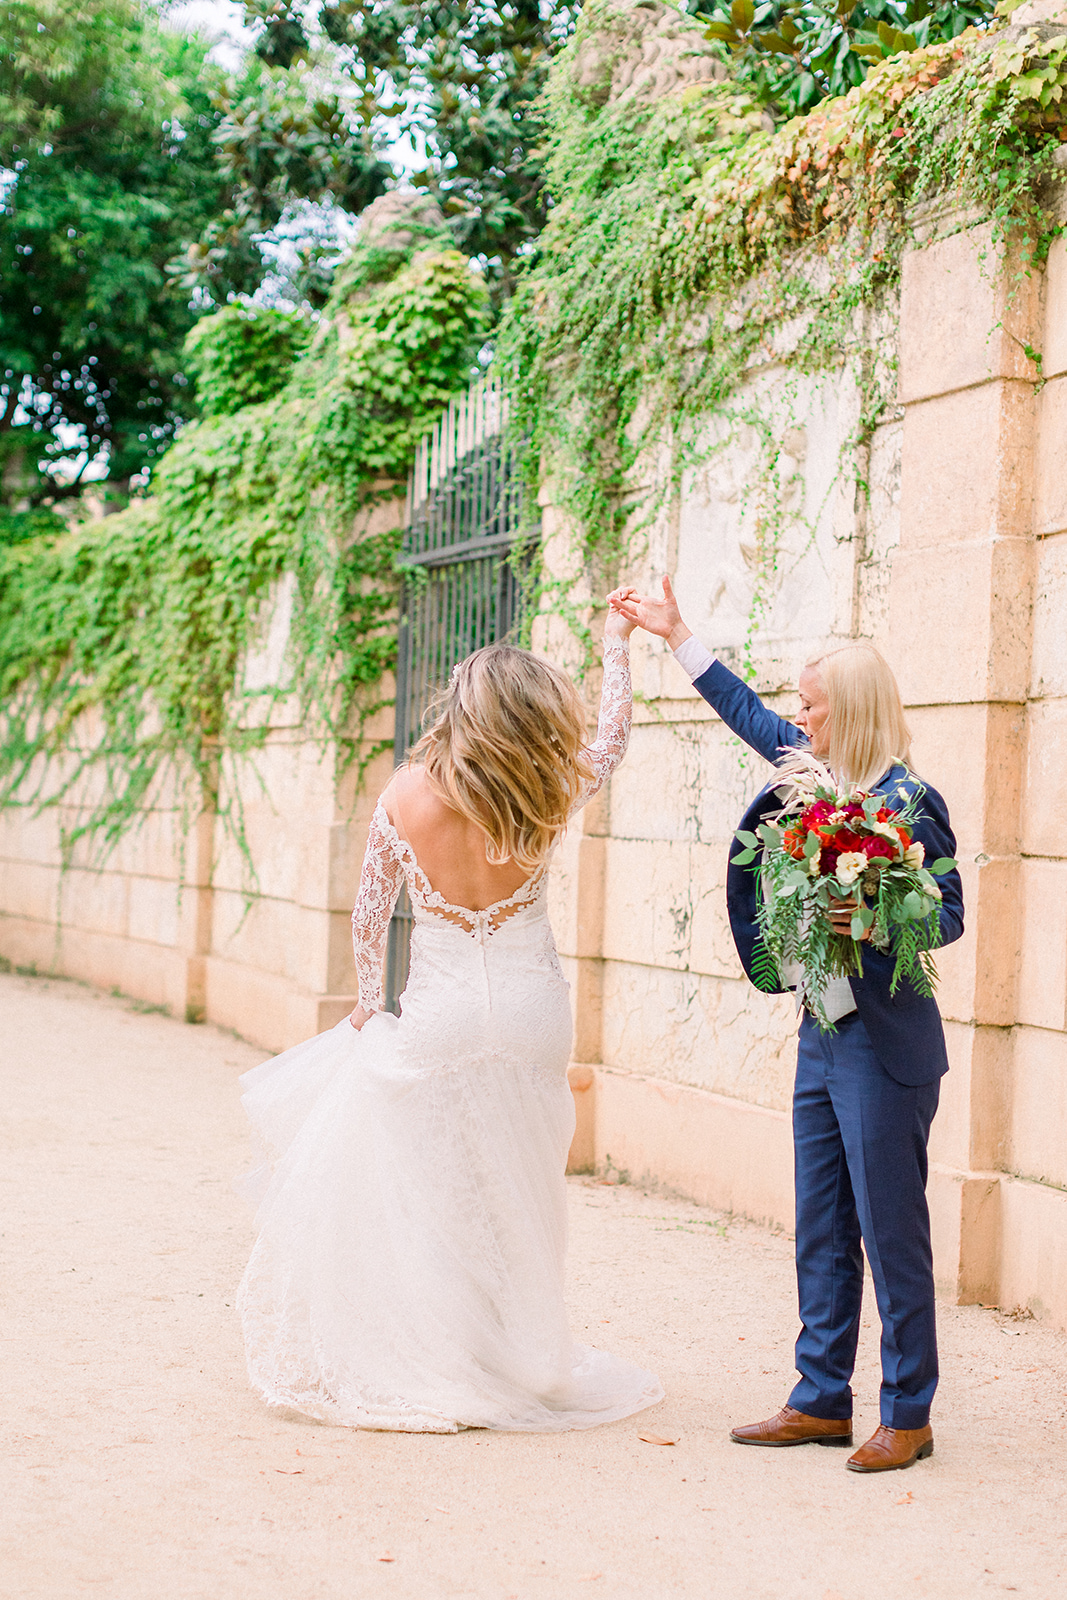 Four Corners Photography Liz and Jessica Wedding in Barcelona Finals-589best atlanta wedding photographer barcelona wedding atlanta wedding spain wedding photographer barcelona wedding photographer.jpg